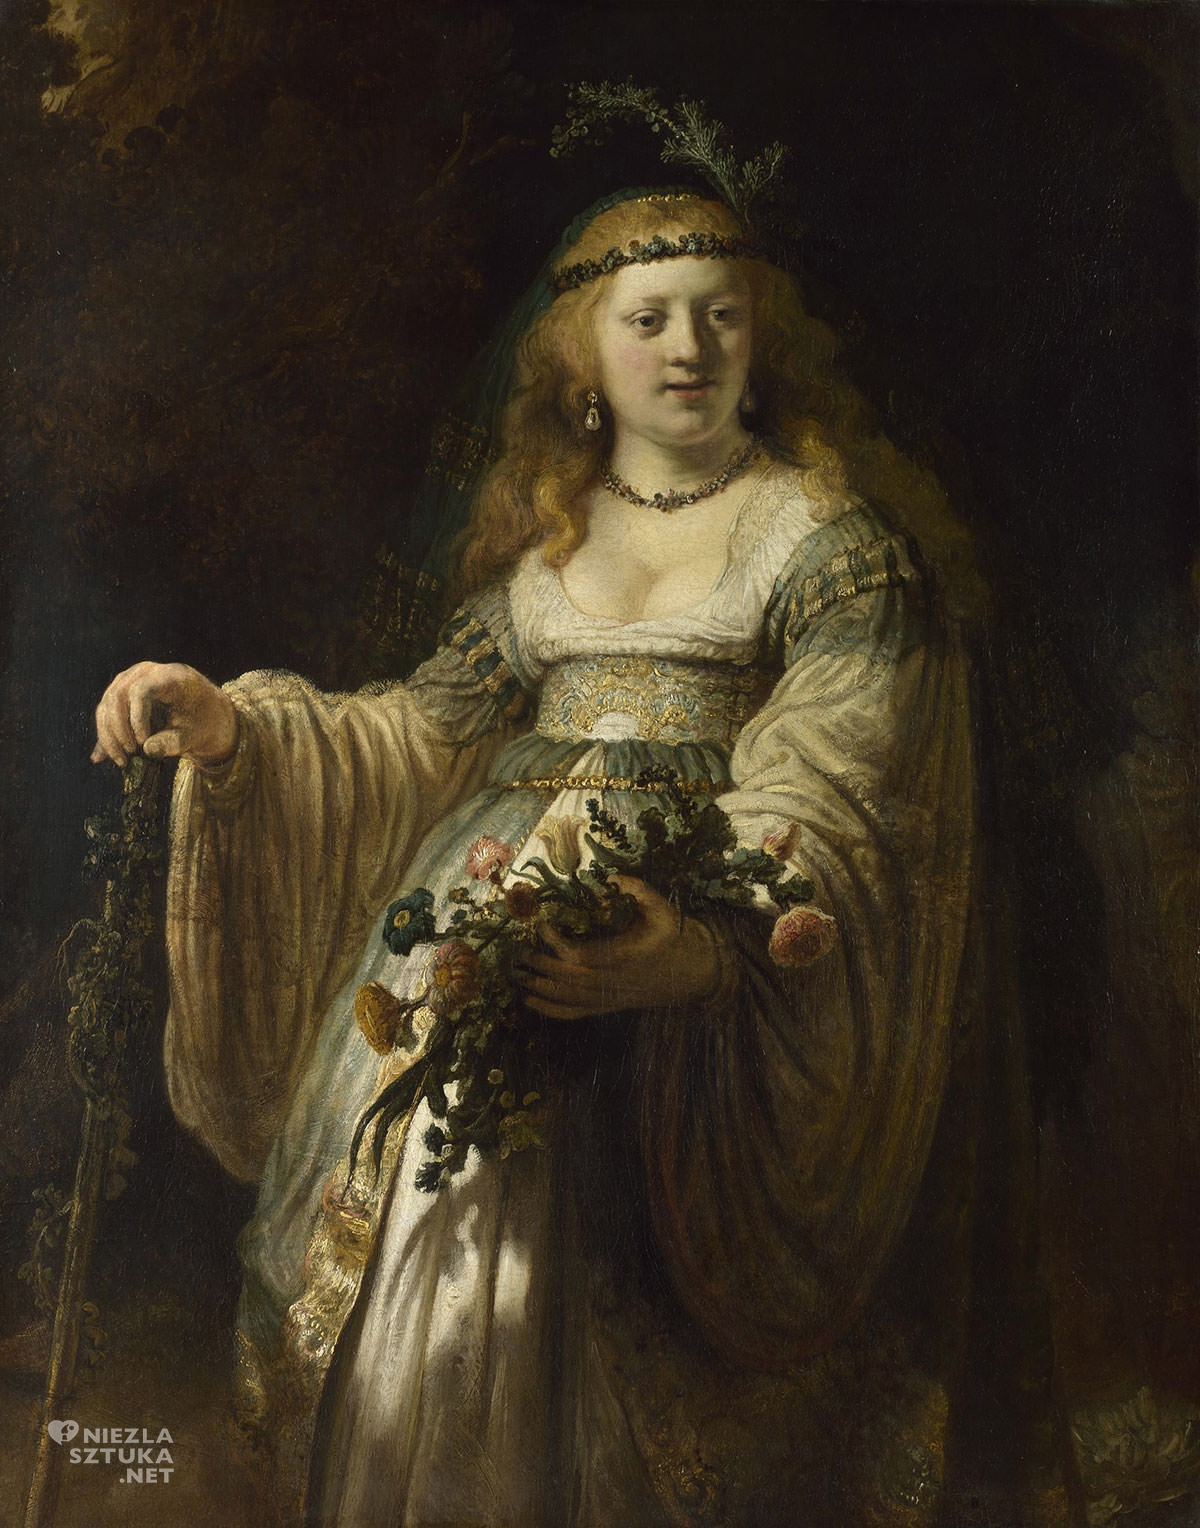 Rembrandt, Rembrandt van Rijn, Saskia van Uylenburgh w stroju arkadyjskim, sztuka niderlandzka, malarstwo niderlandzkie, portret, żona malarza, Niezła Sztuka